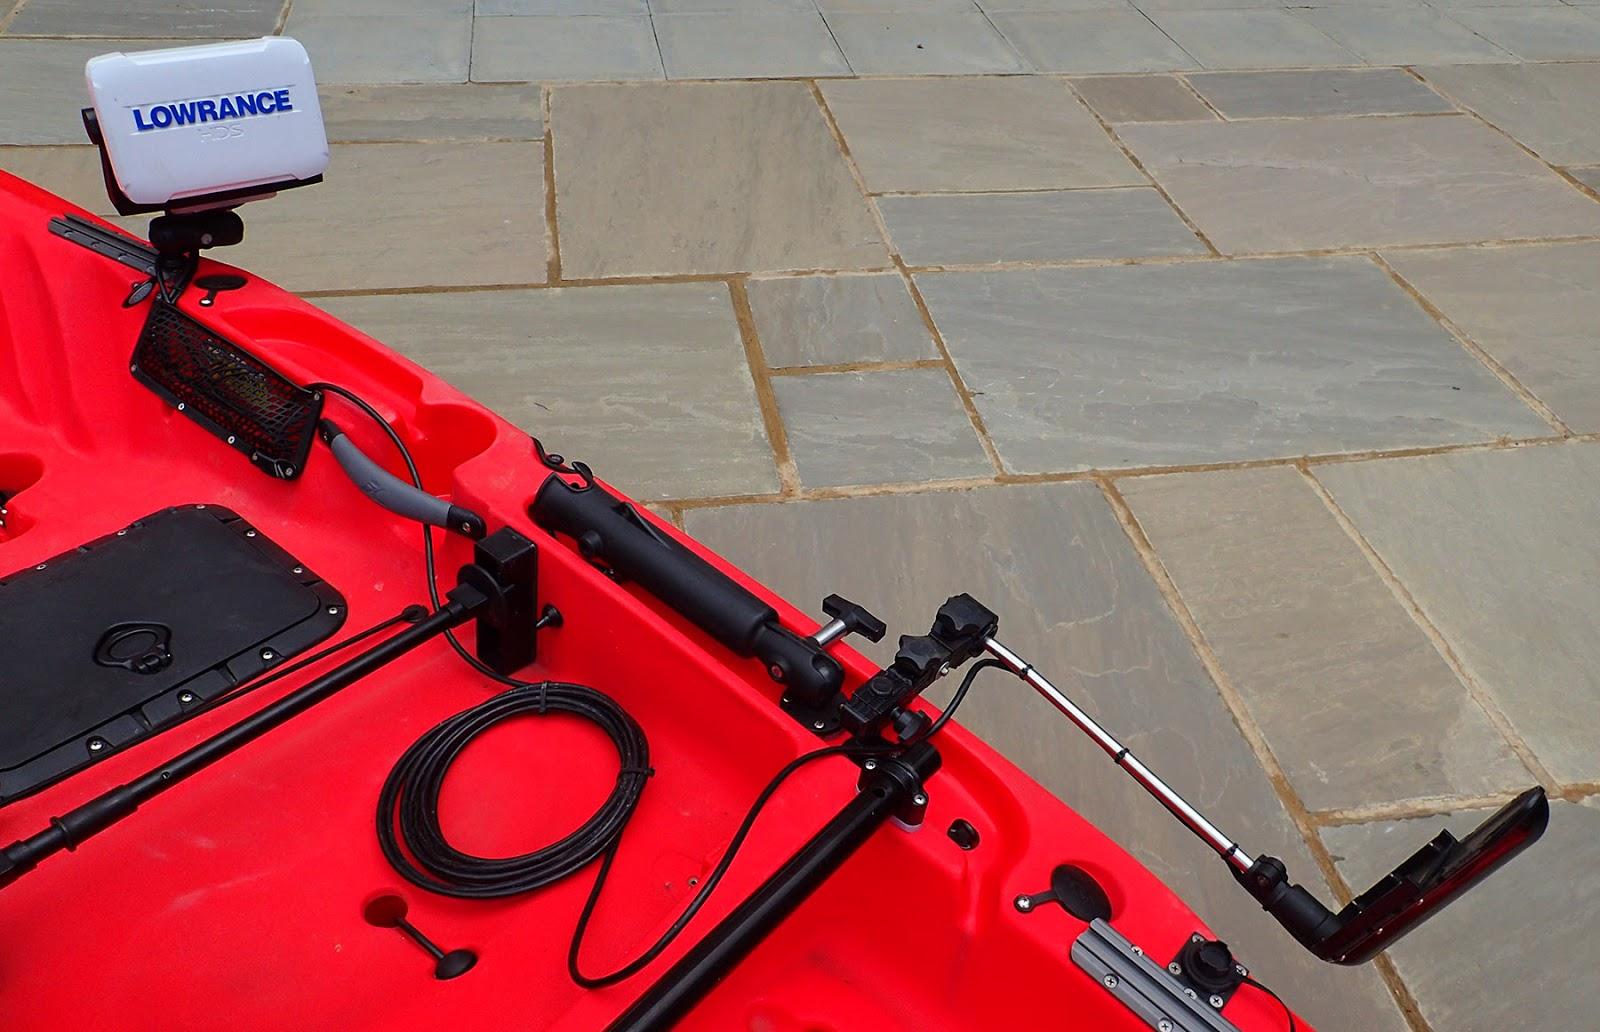 Saltwater kayak fisherman: UPGRADE - Lowrance TotalScan All-In-One